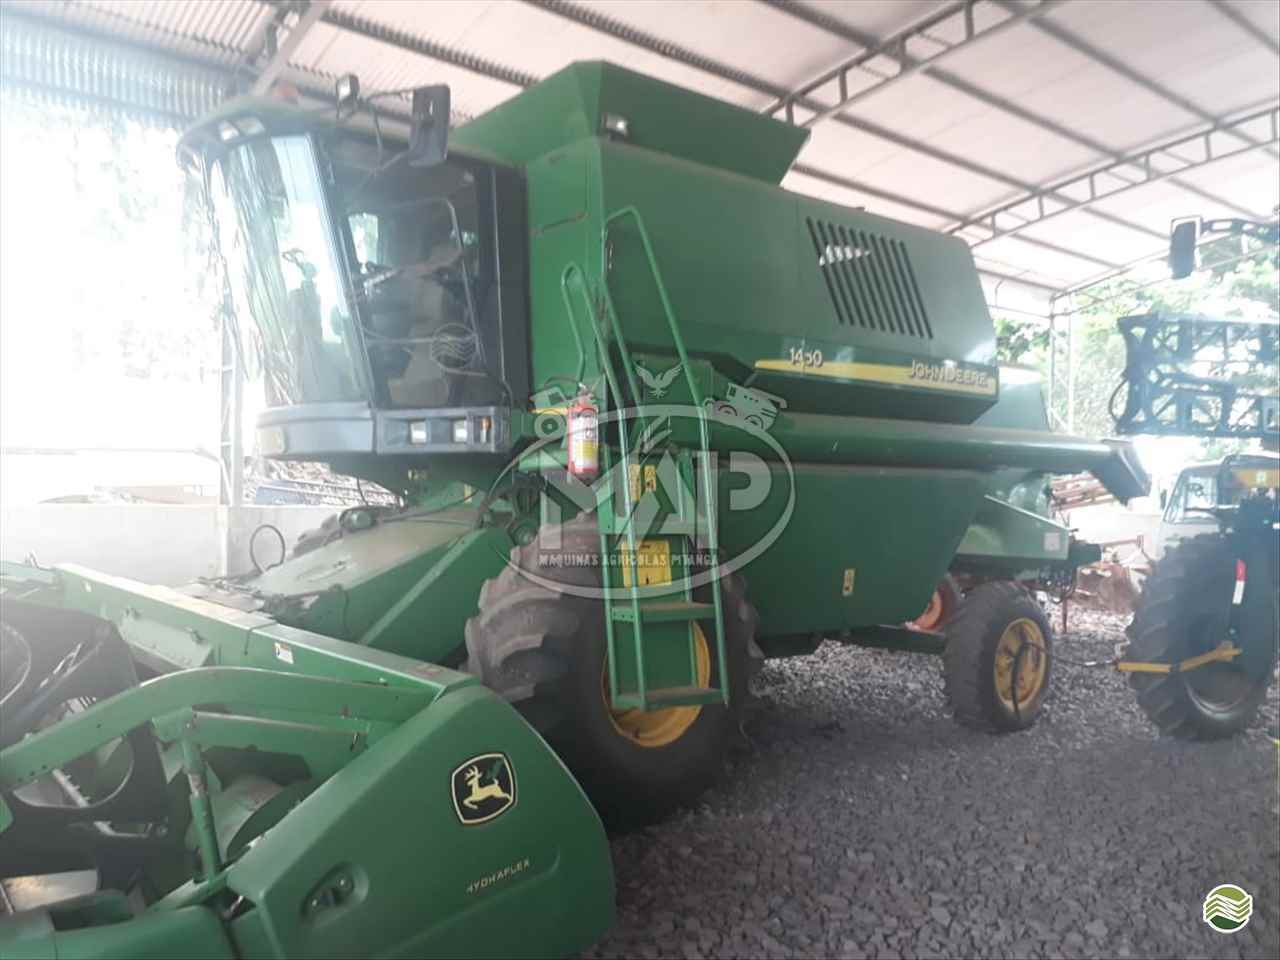 JOHN DEERE JOHN DEERE 1450  2008/2008 Máquinas Agrícolas Pitanga